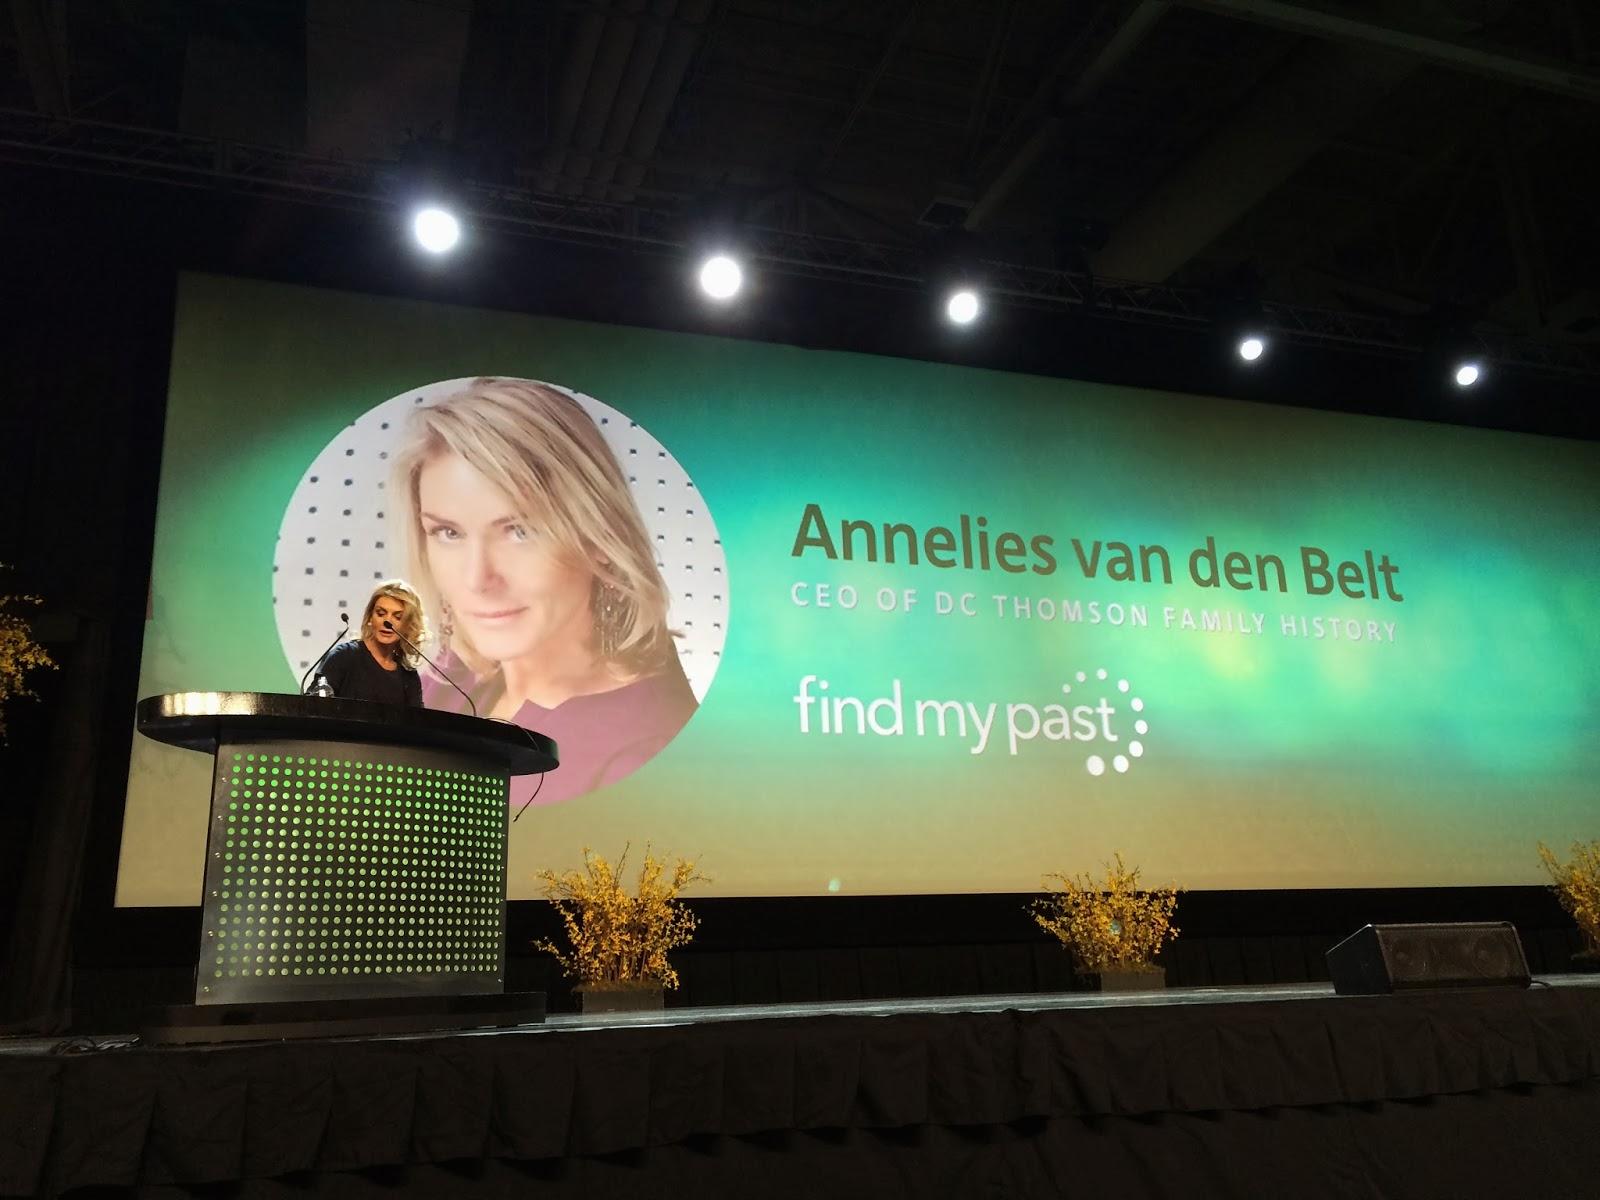 Annelies van den Belt of DC Thomson - Thursday Keynote #1